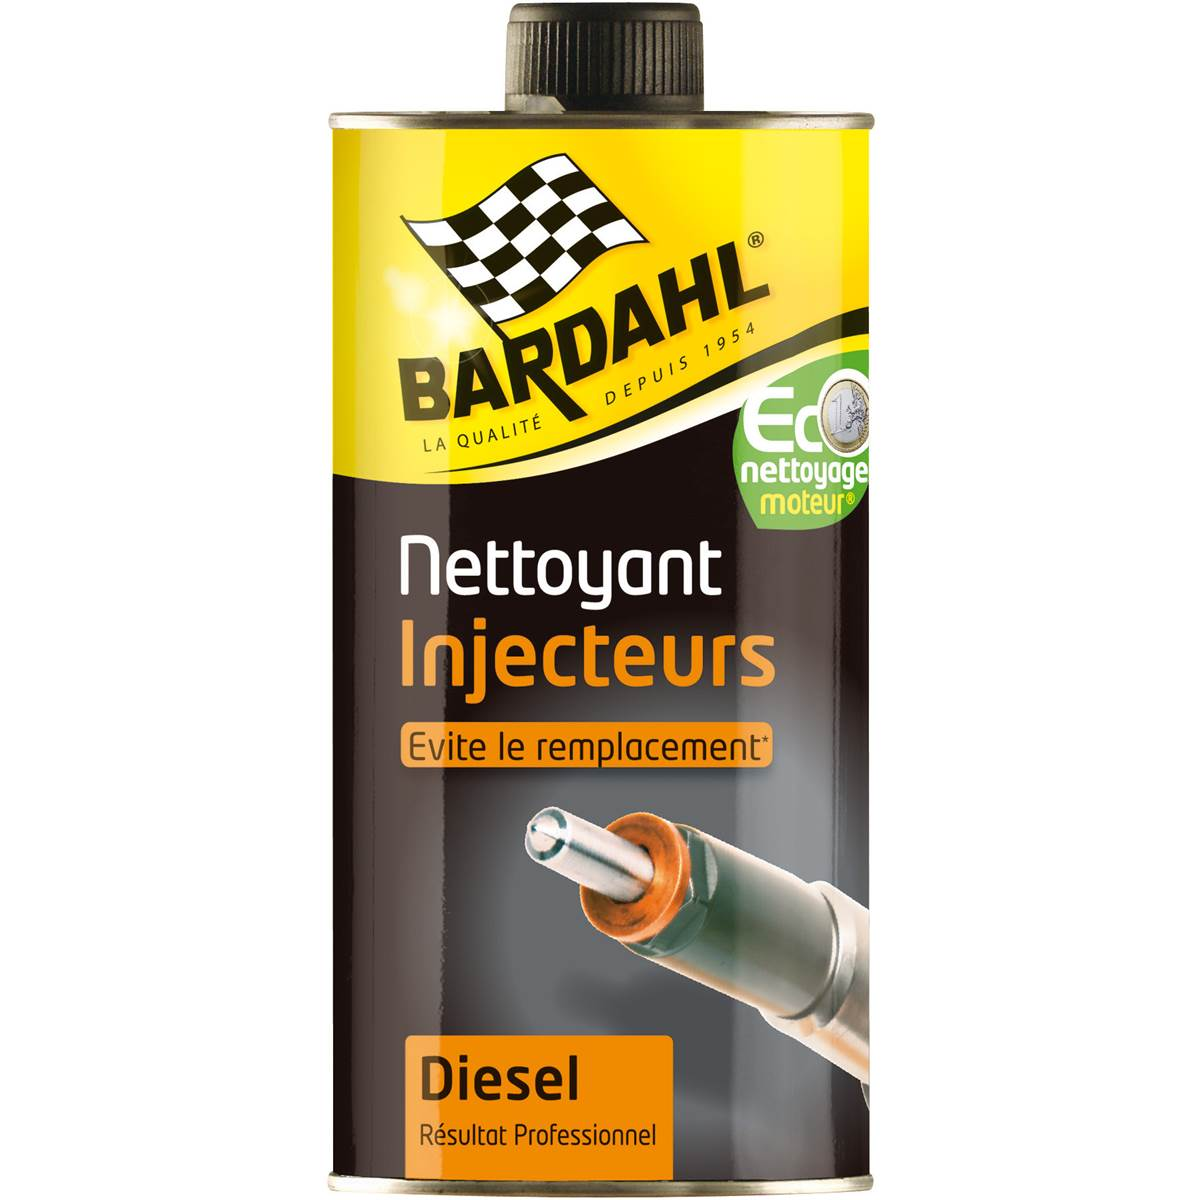 Nettoyant injecteurs Diesel Bardahl 1 L